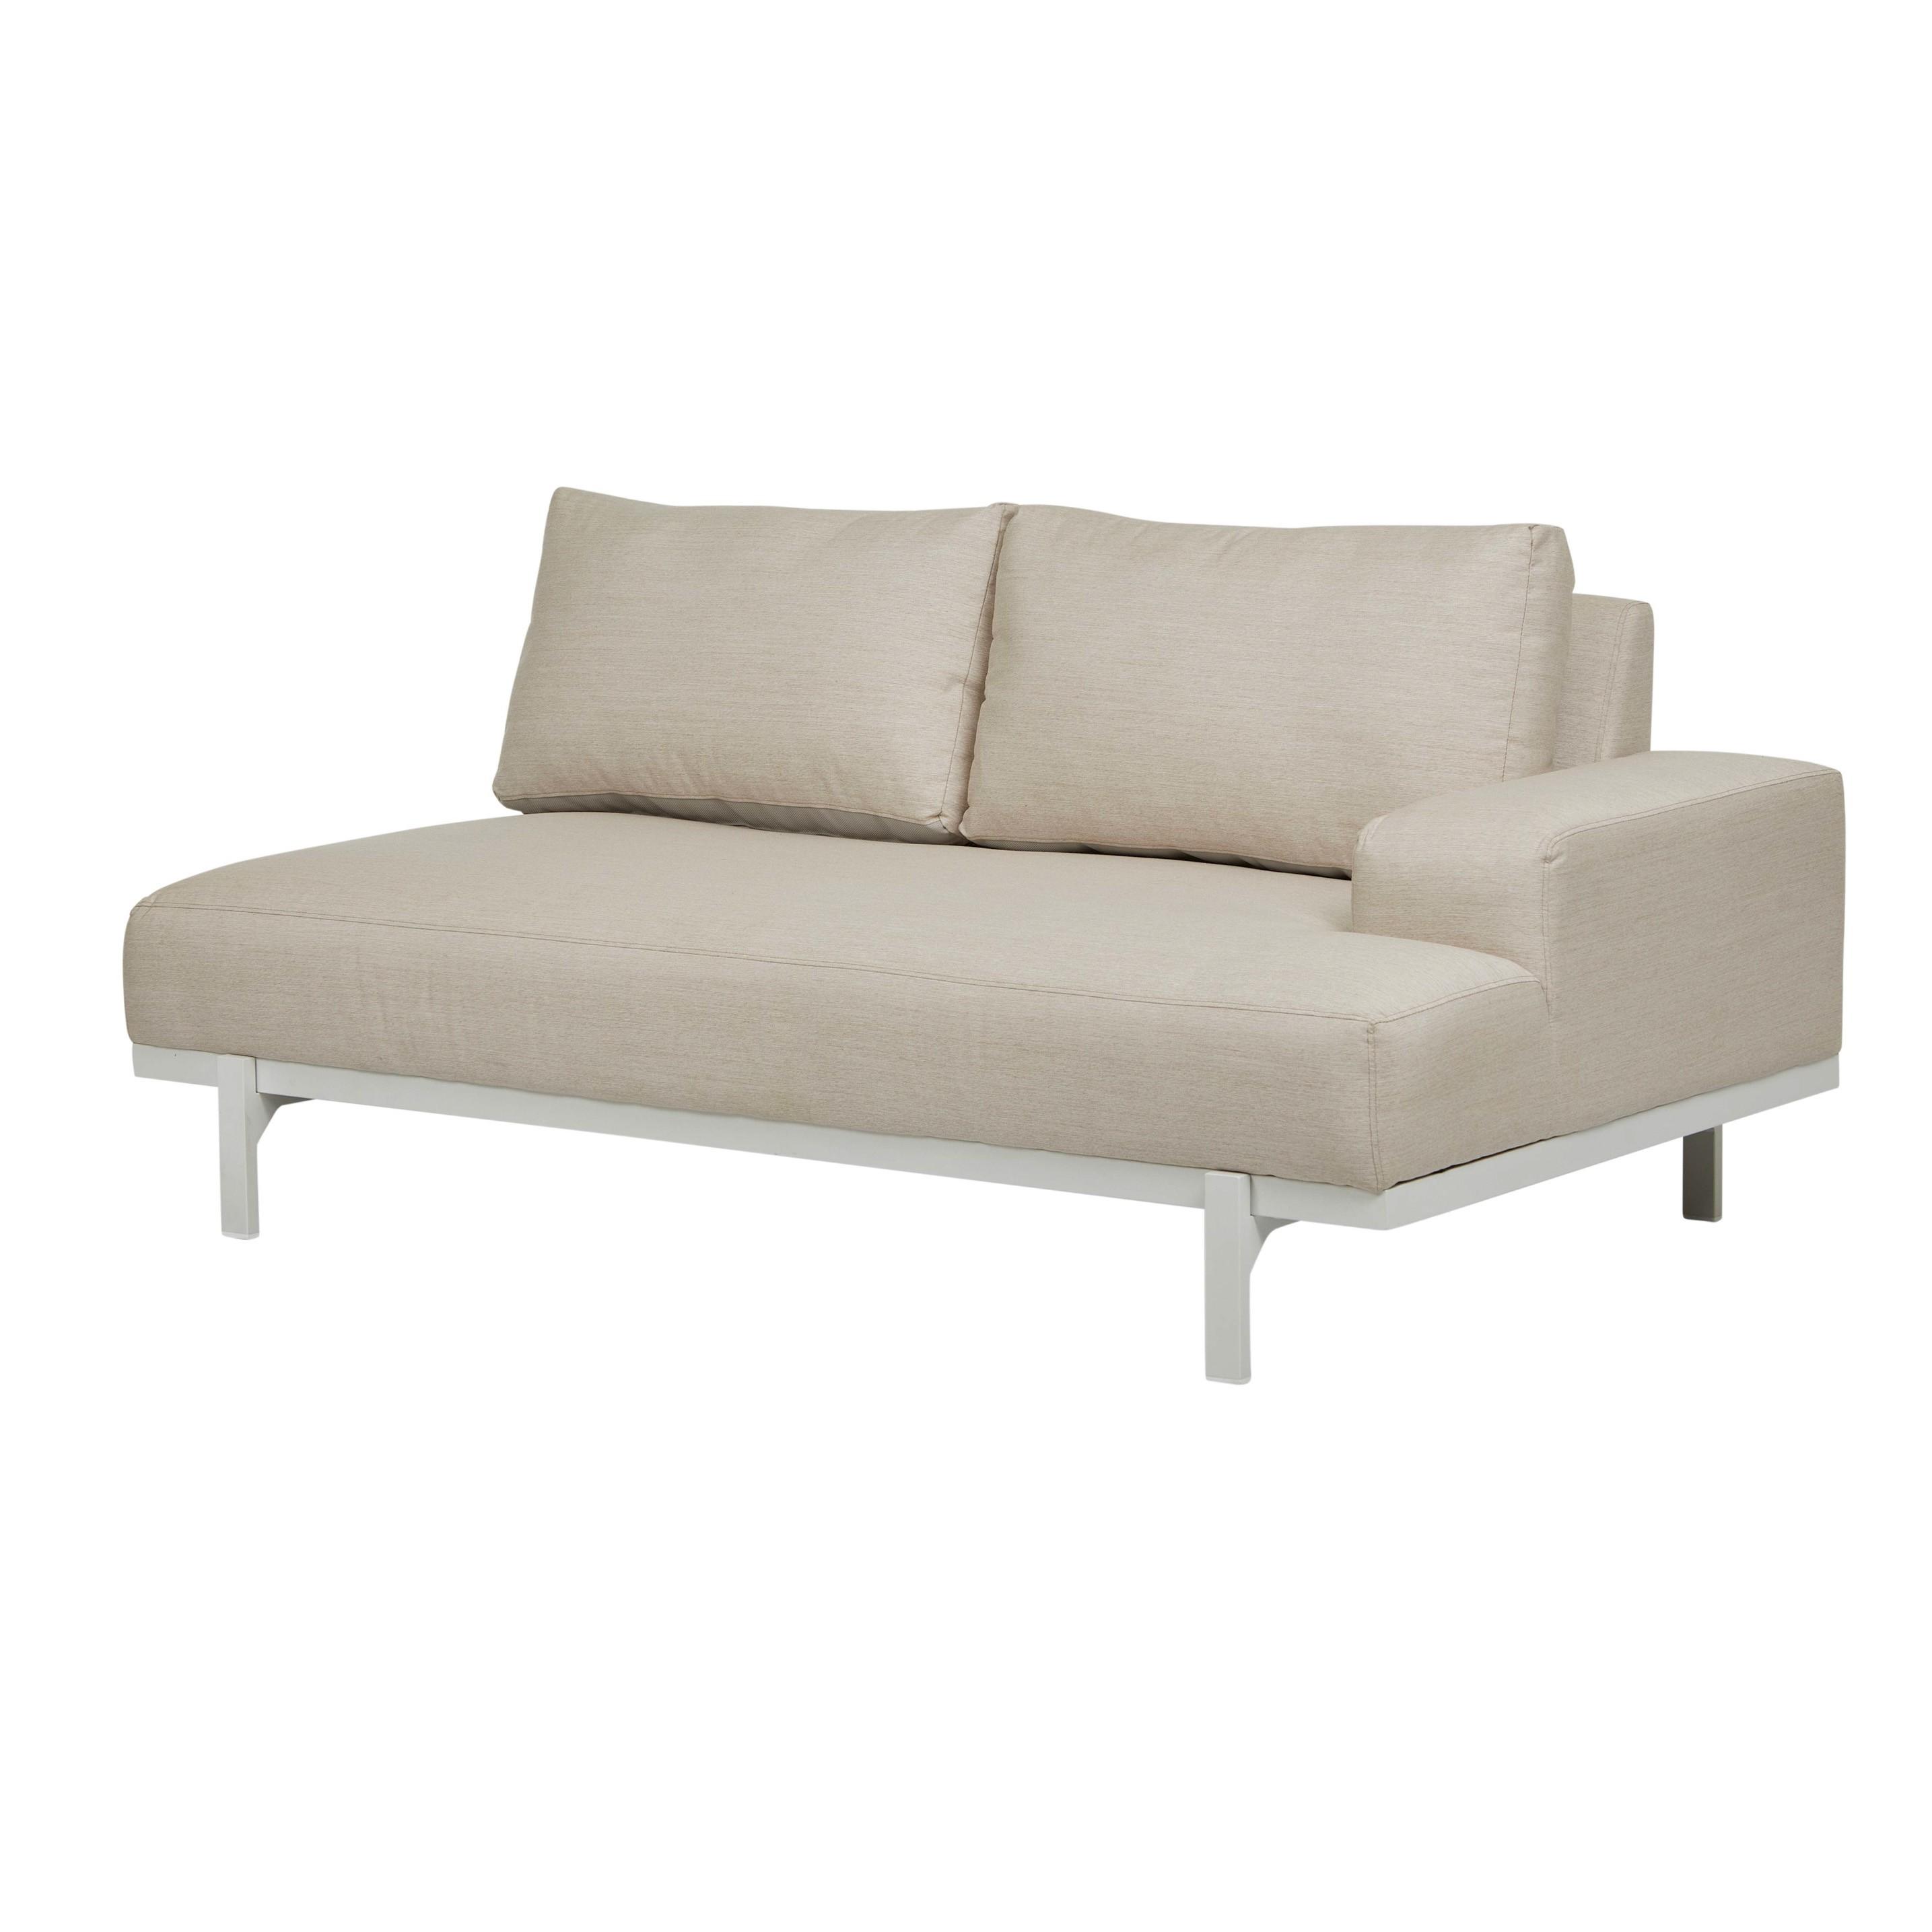 Furniture Hero-Images Sofas aruba-platform-two-seater-right-02